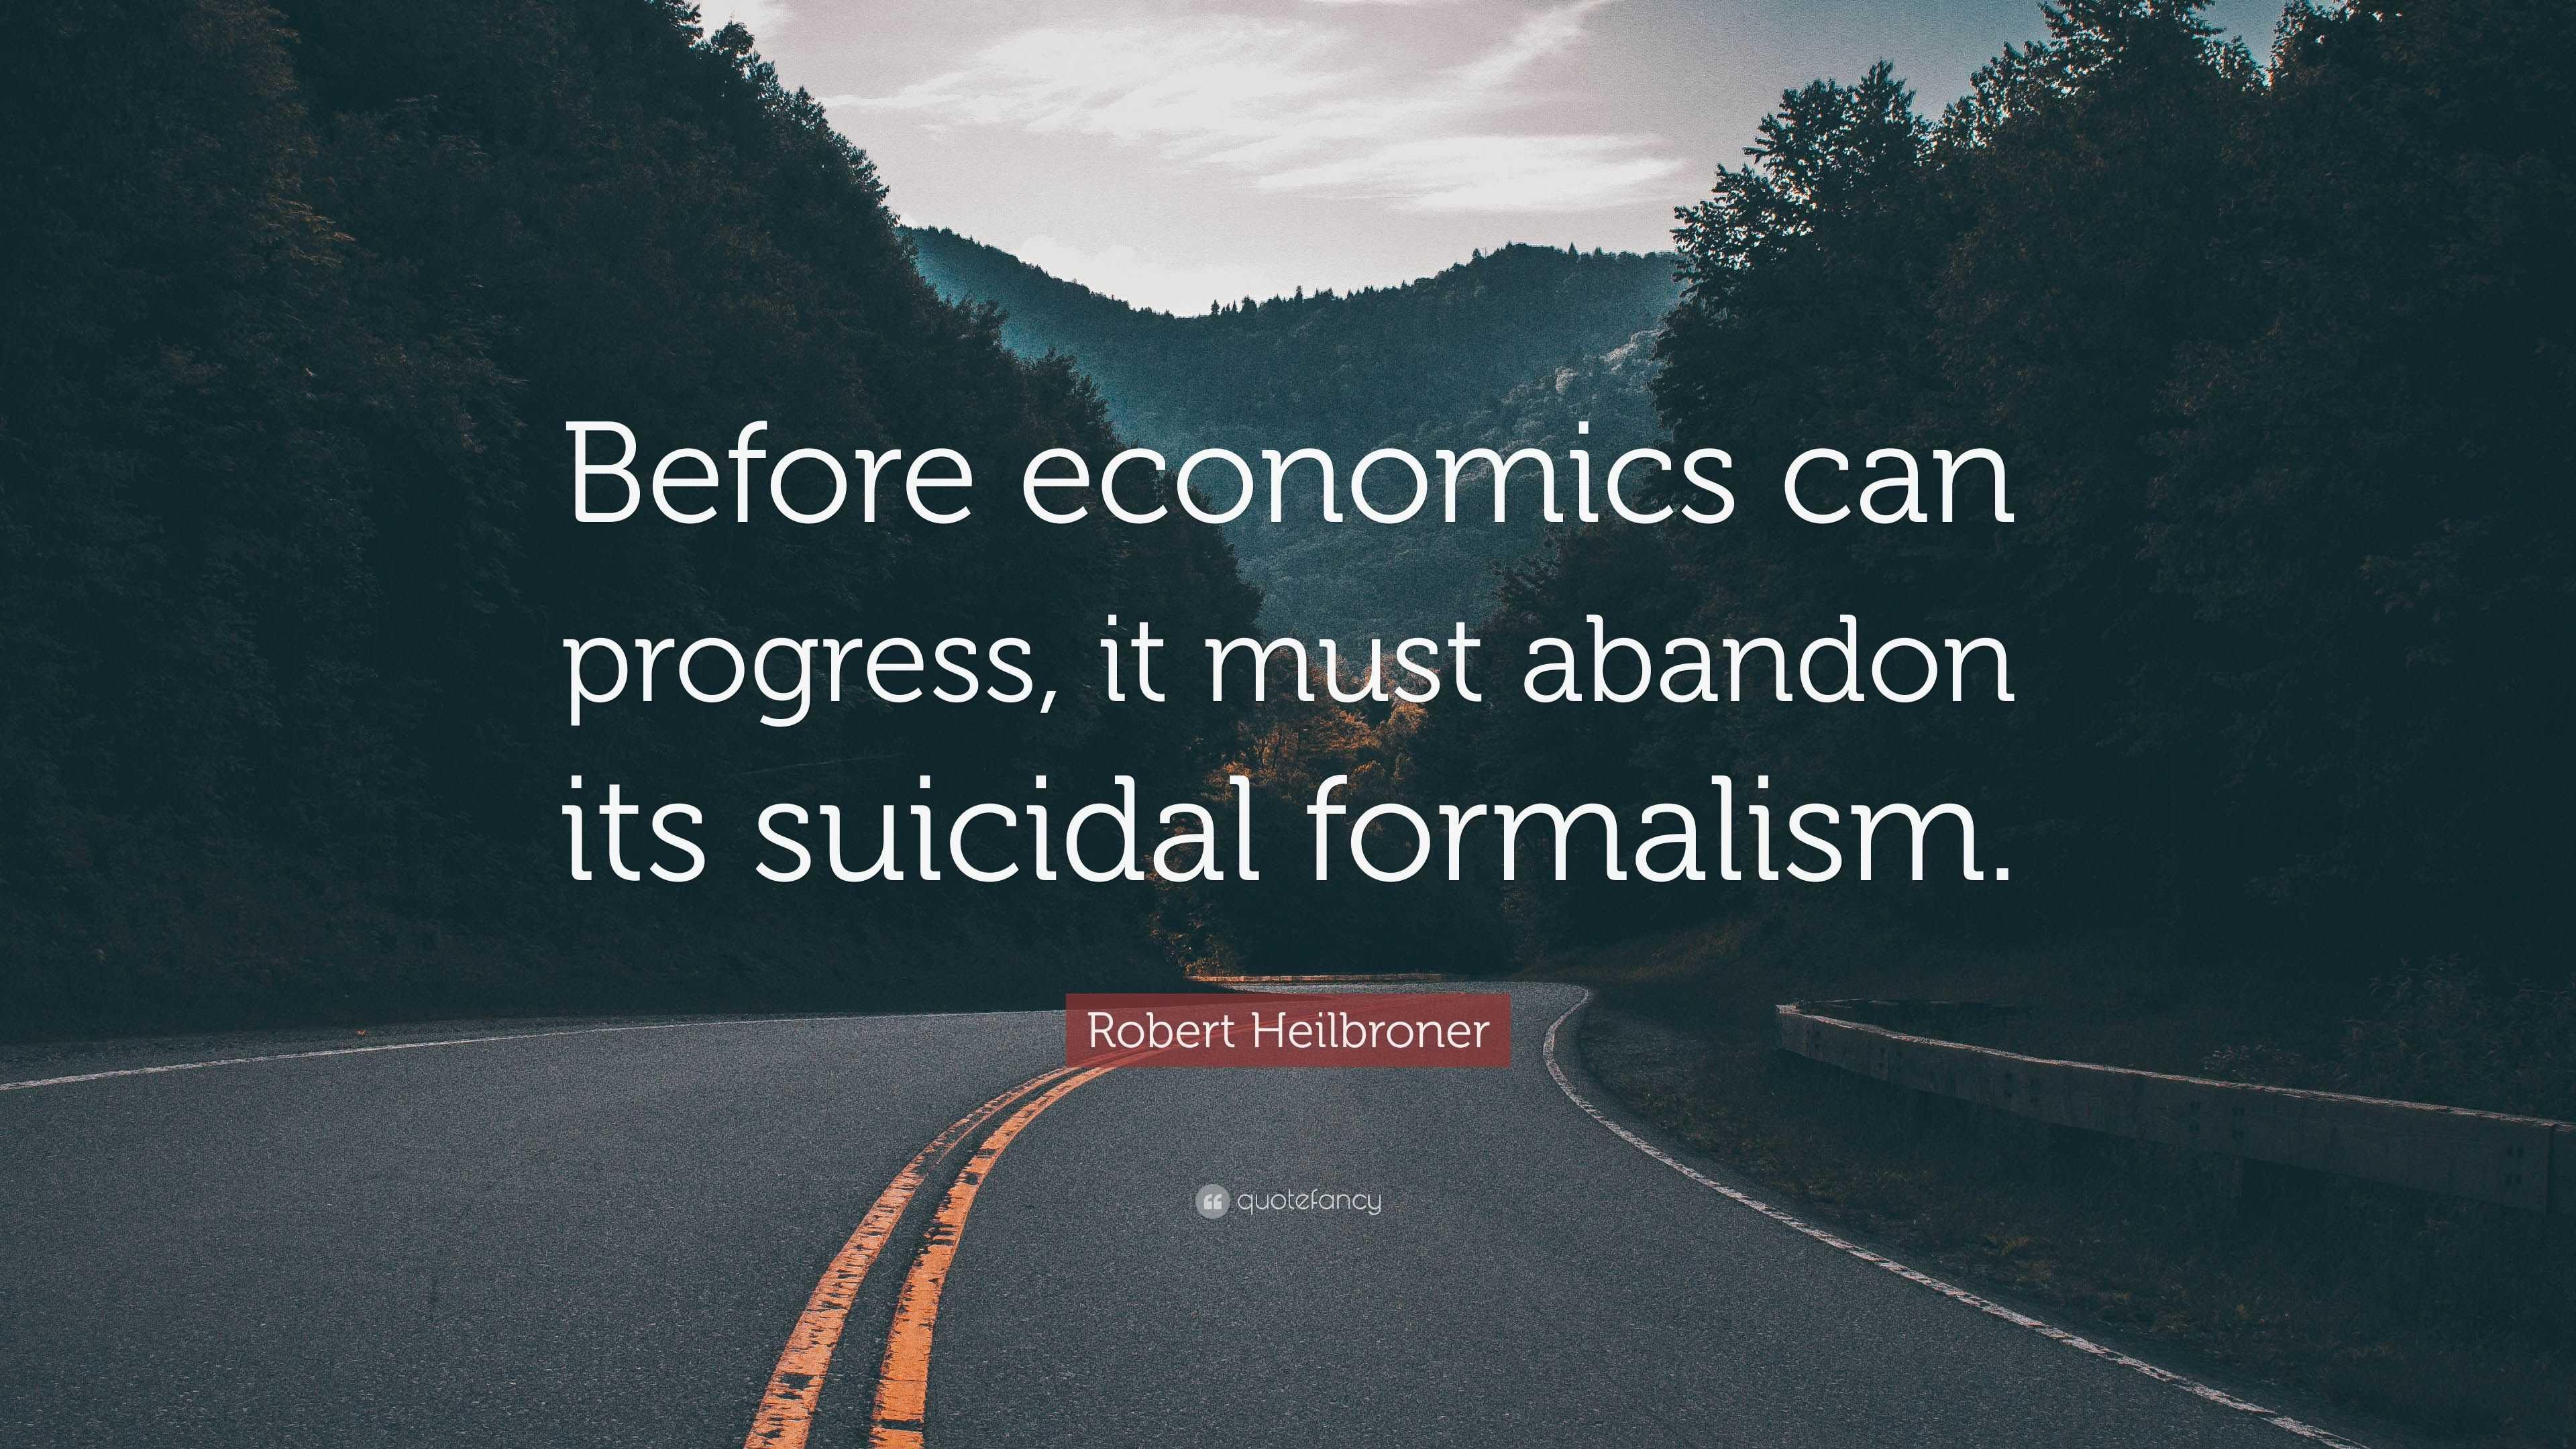 "Robert Heilbroner Quote: ""Before economics can progress, it must abandon  its suicidal formalism."" (7 wallpapers) - Quotefancy"